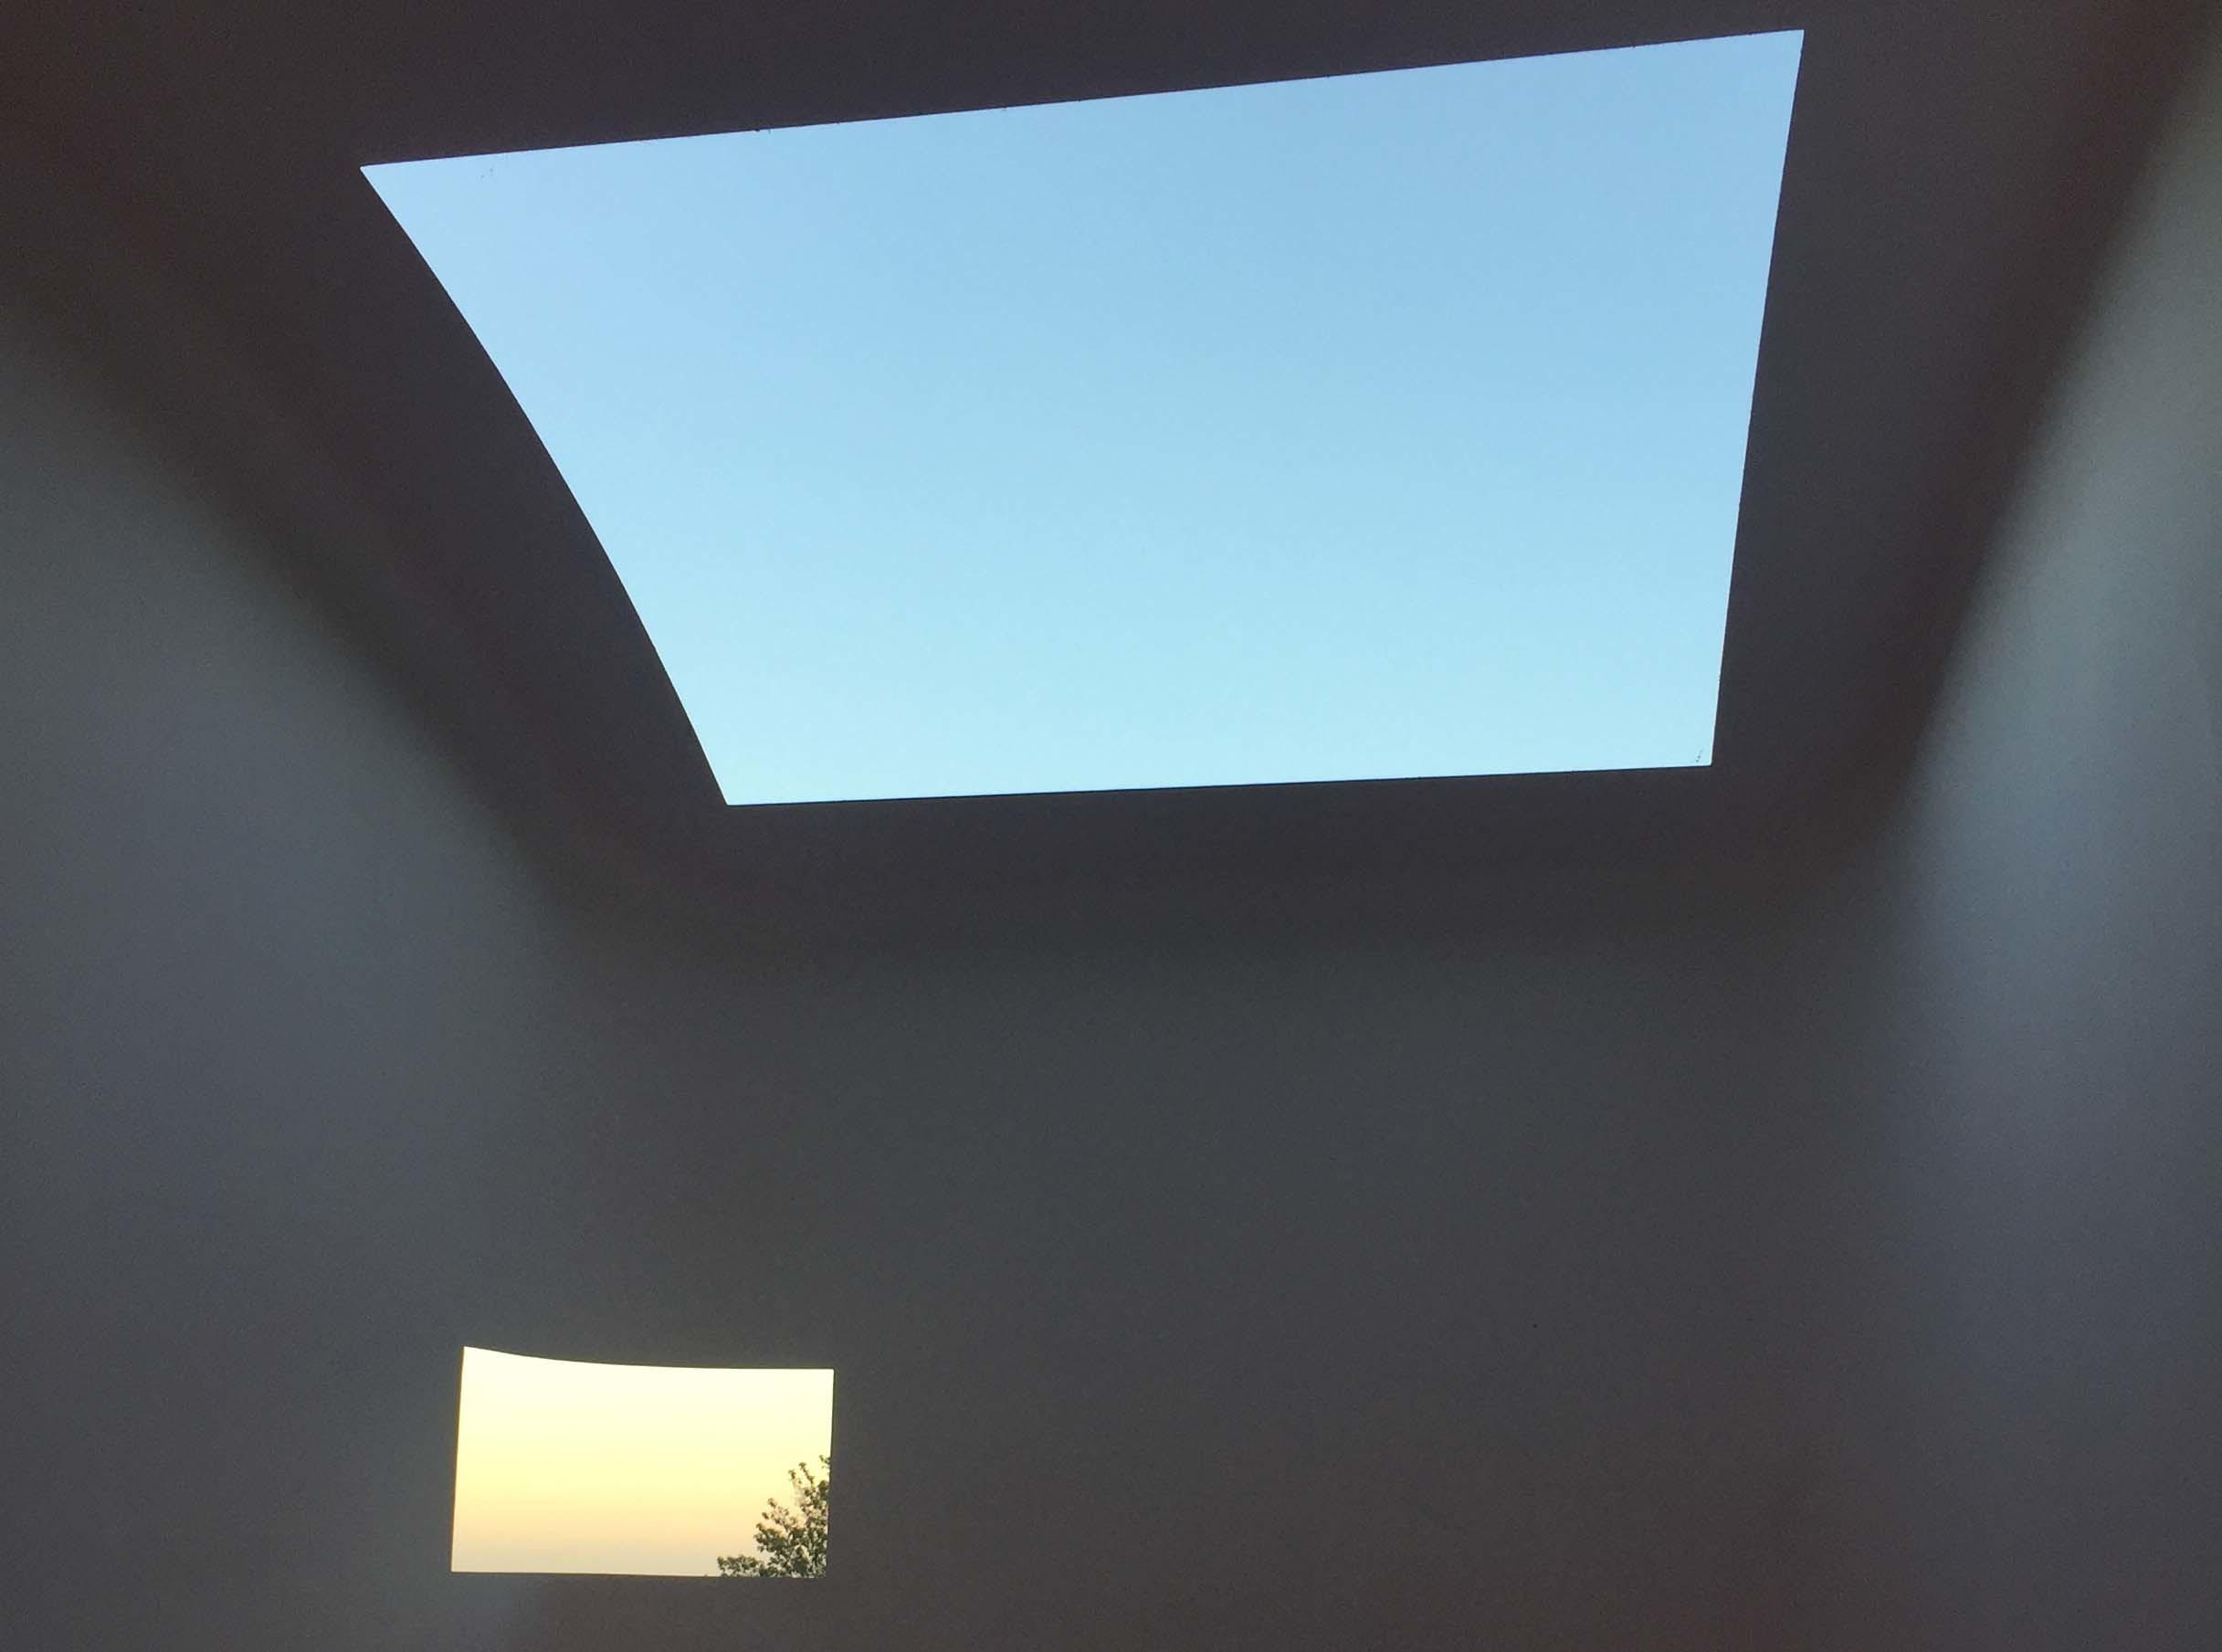 James Turrell's Above Horizon